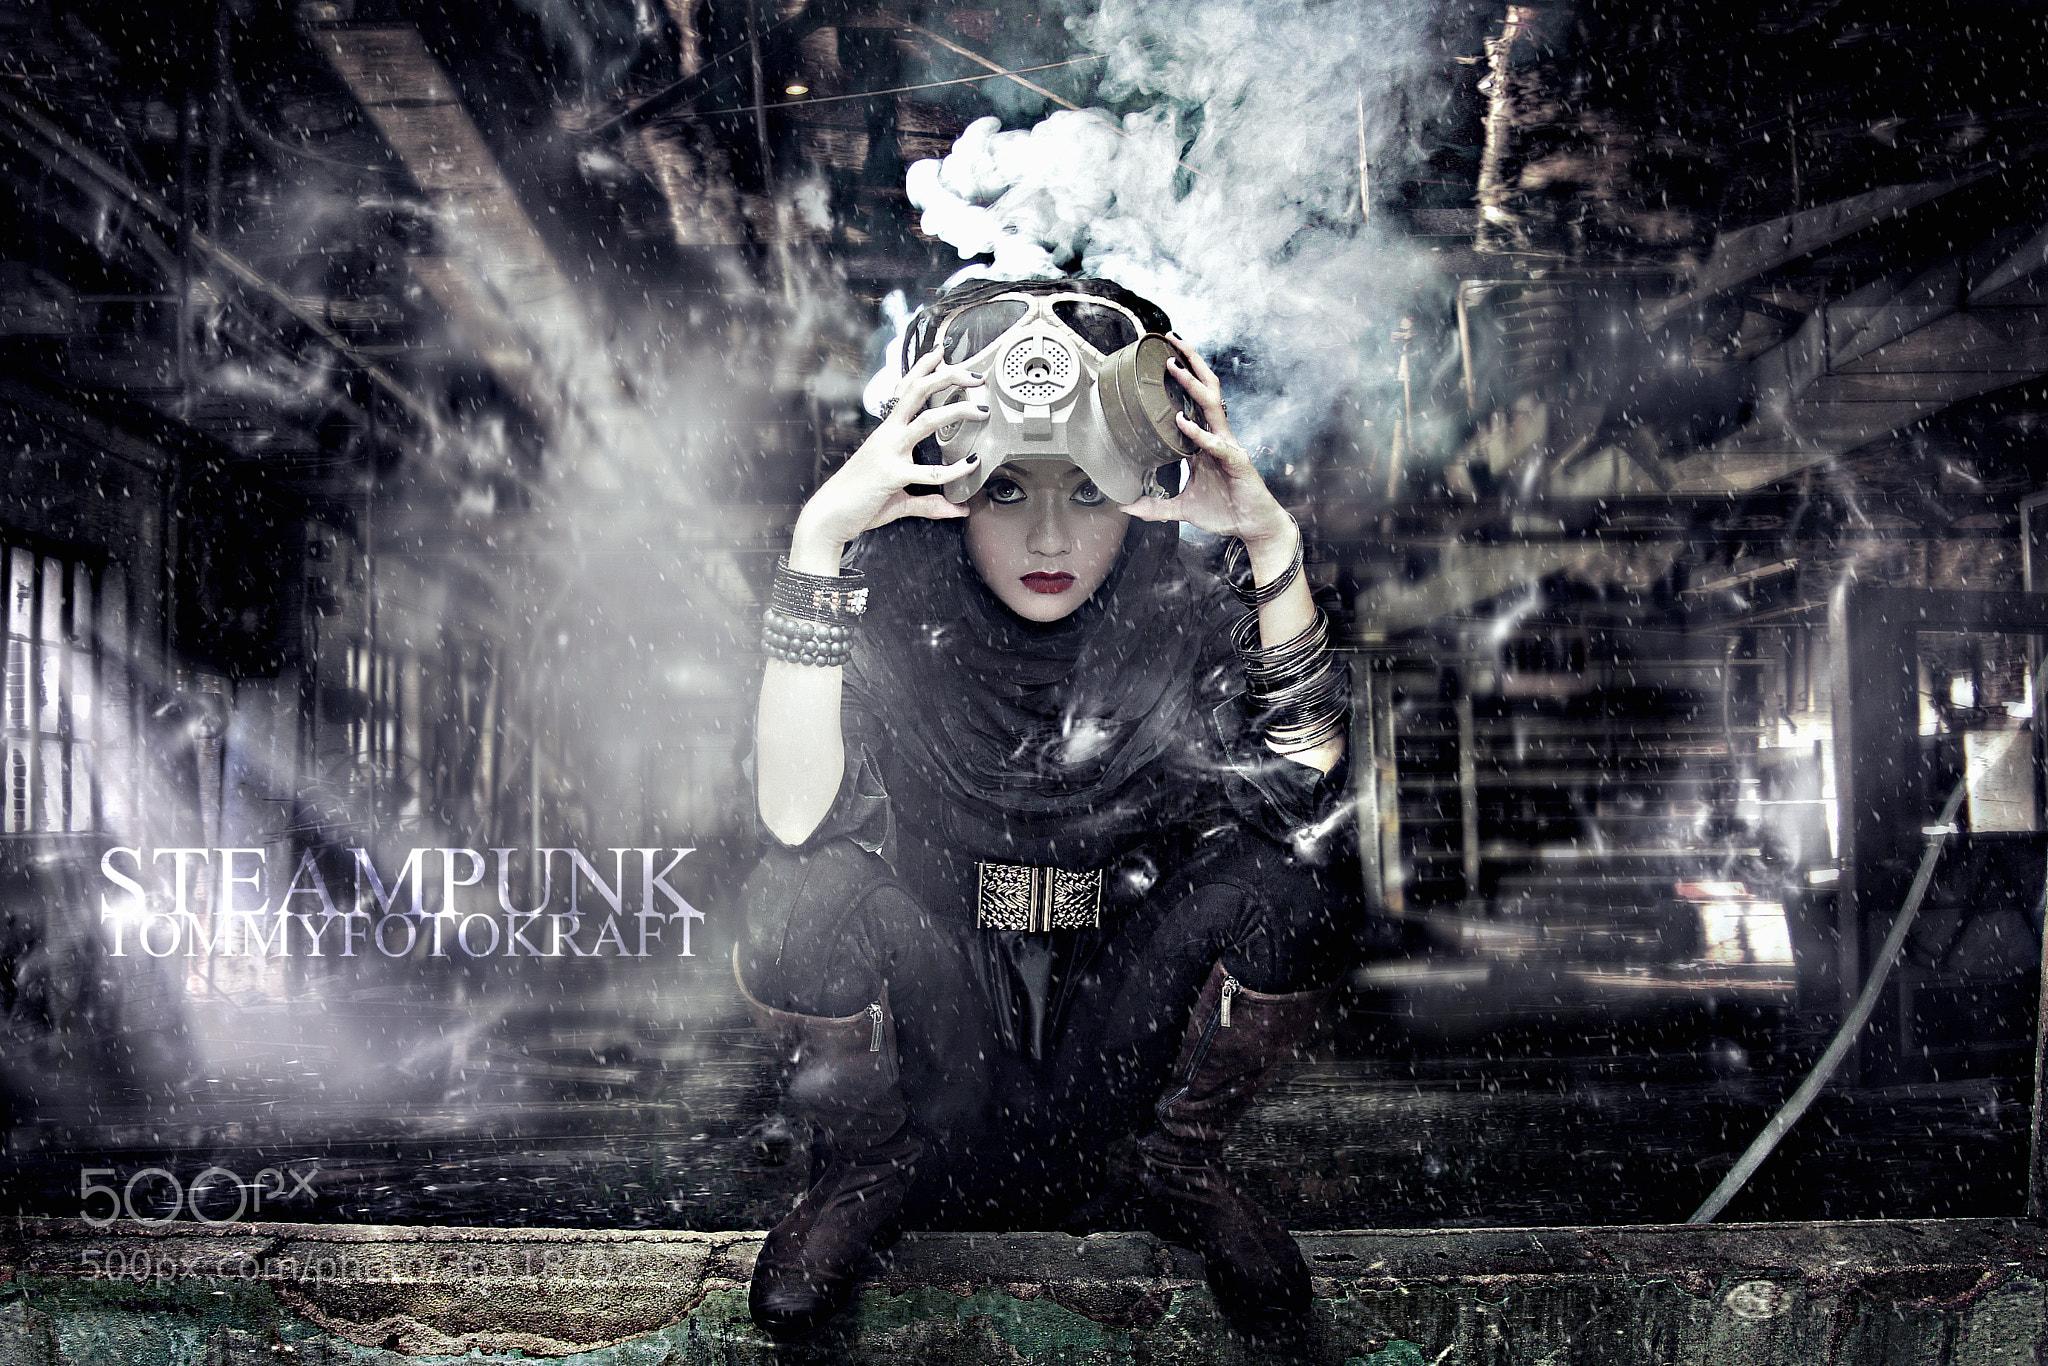 Photograph Steampunk Ninja by The Fotokraft on 500px